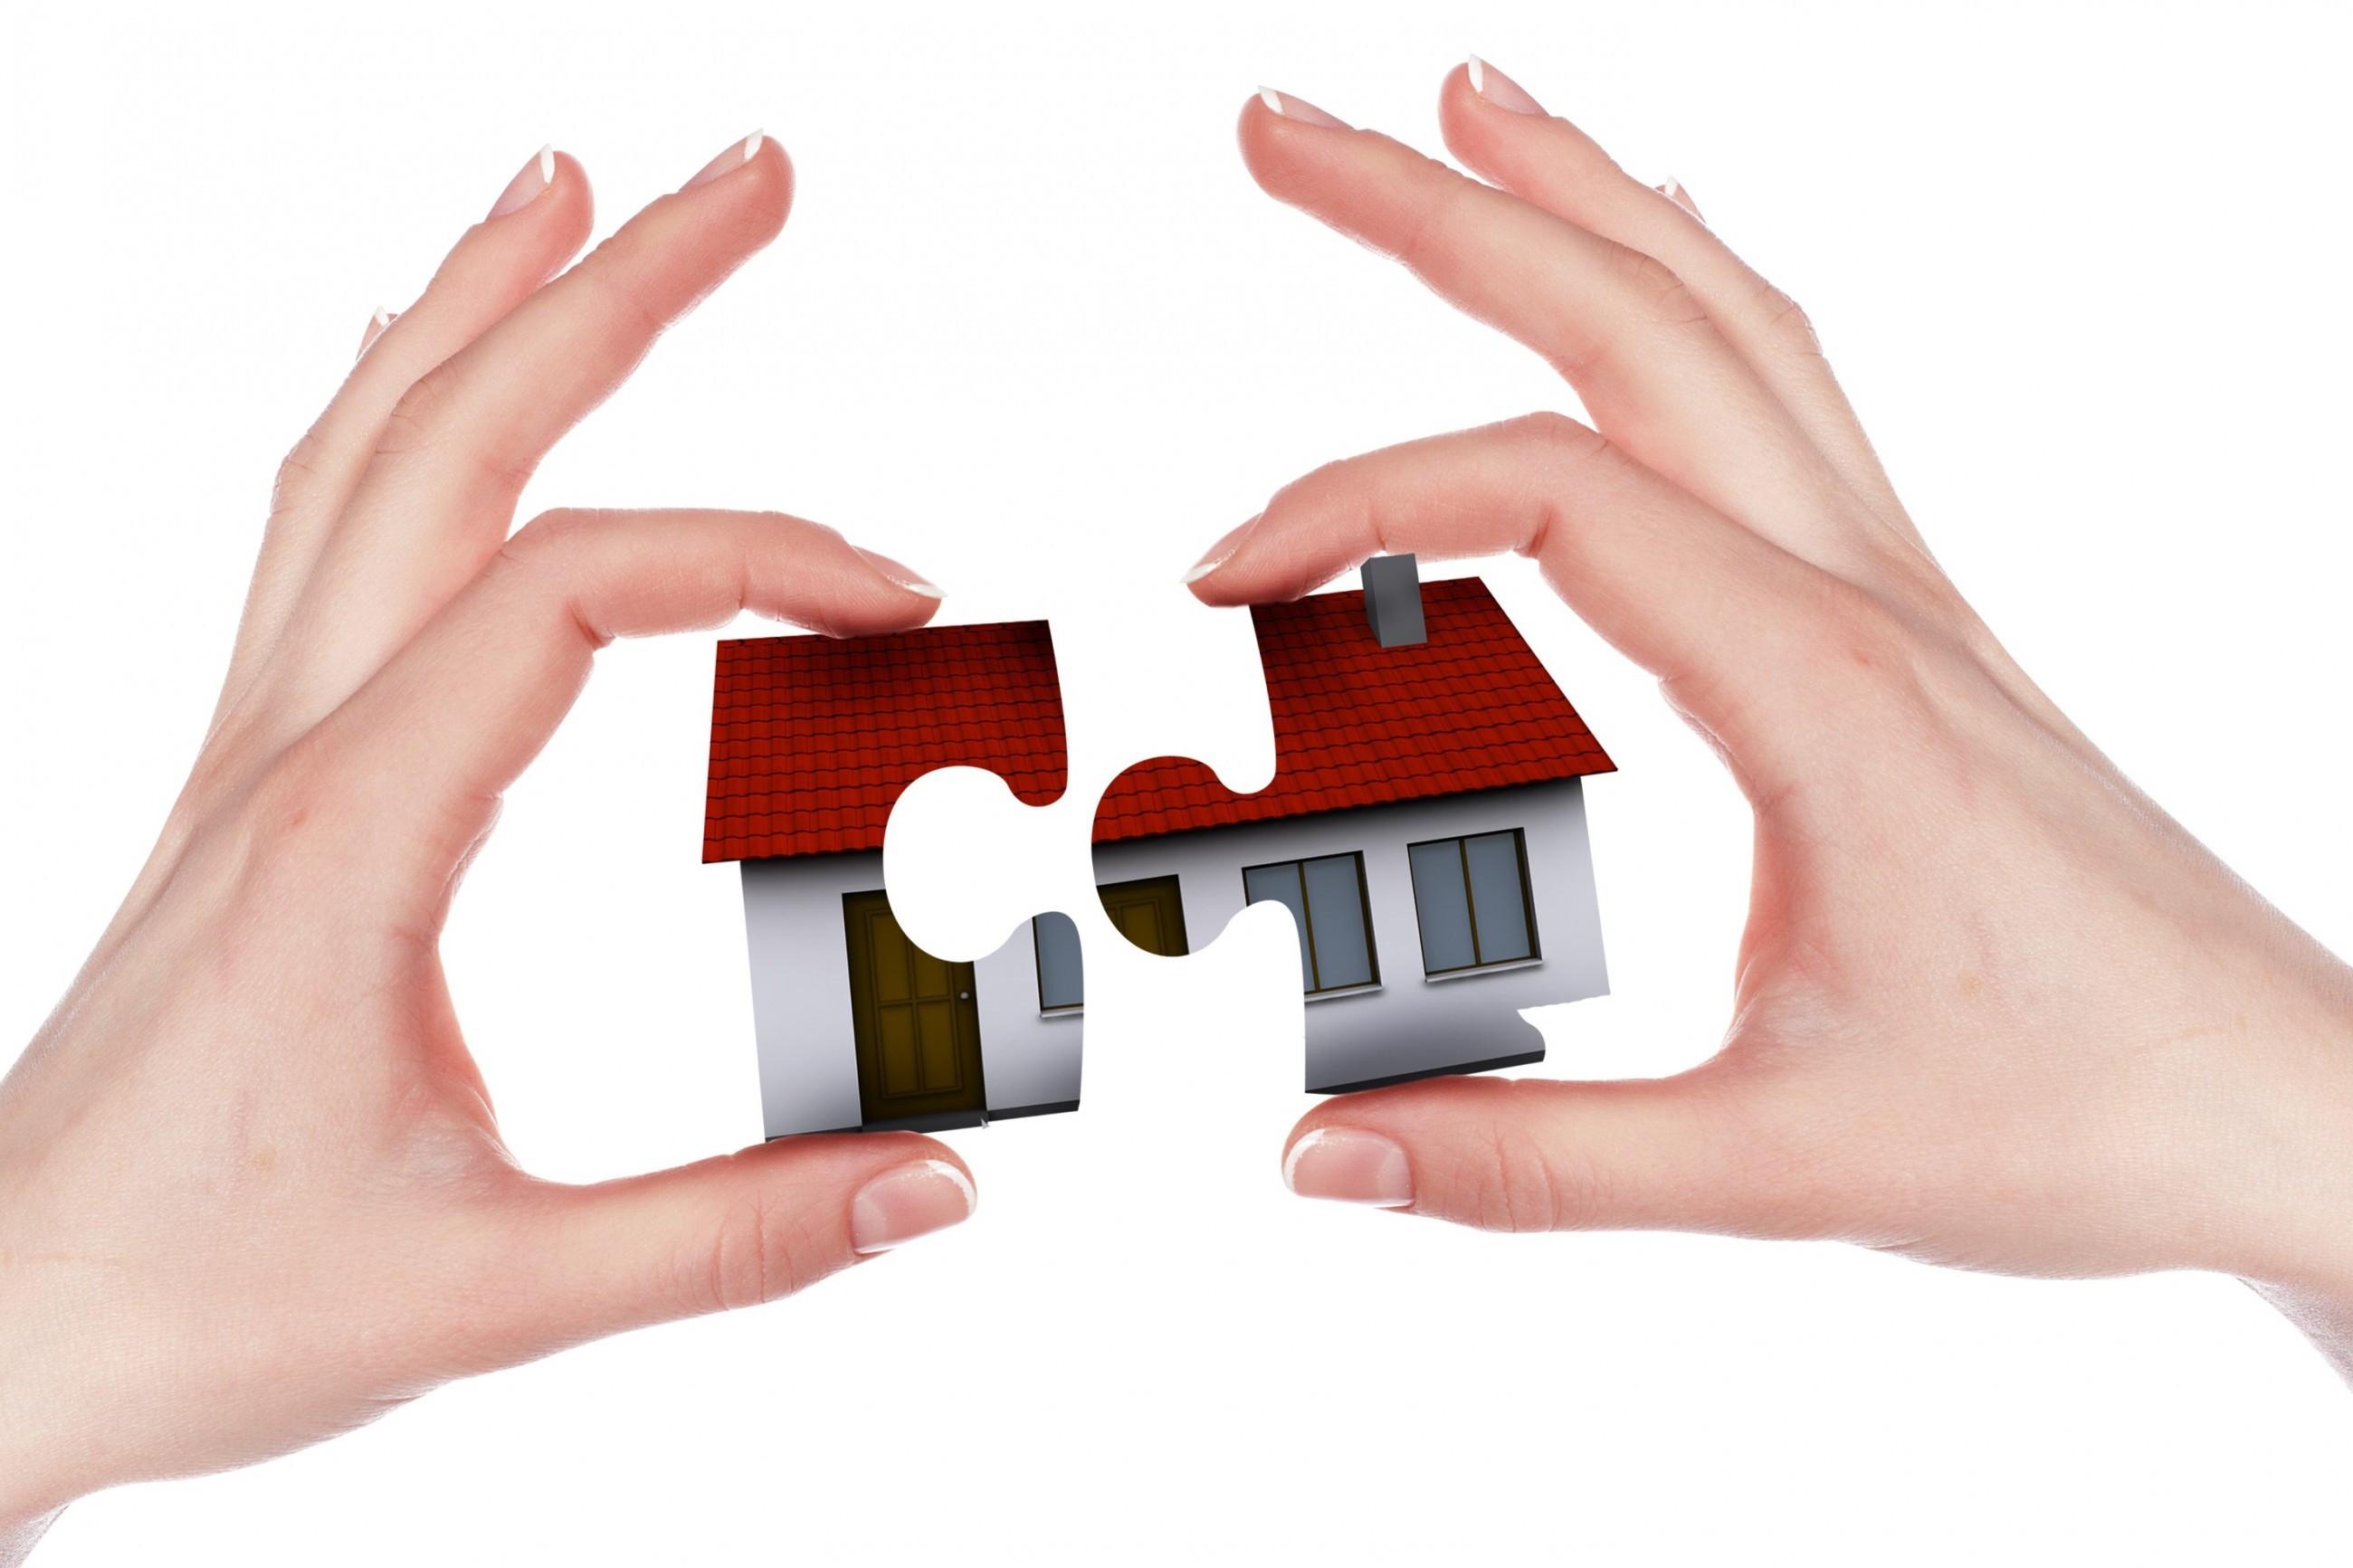 «Согласие супруга на покупку недвижимости» фото - doli v imushhestve